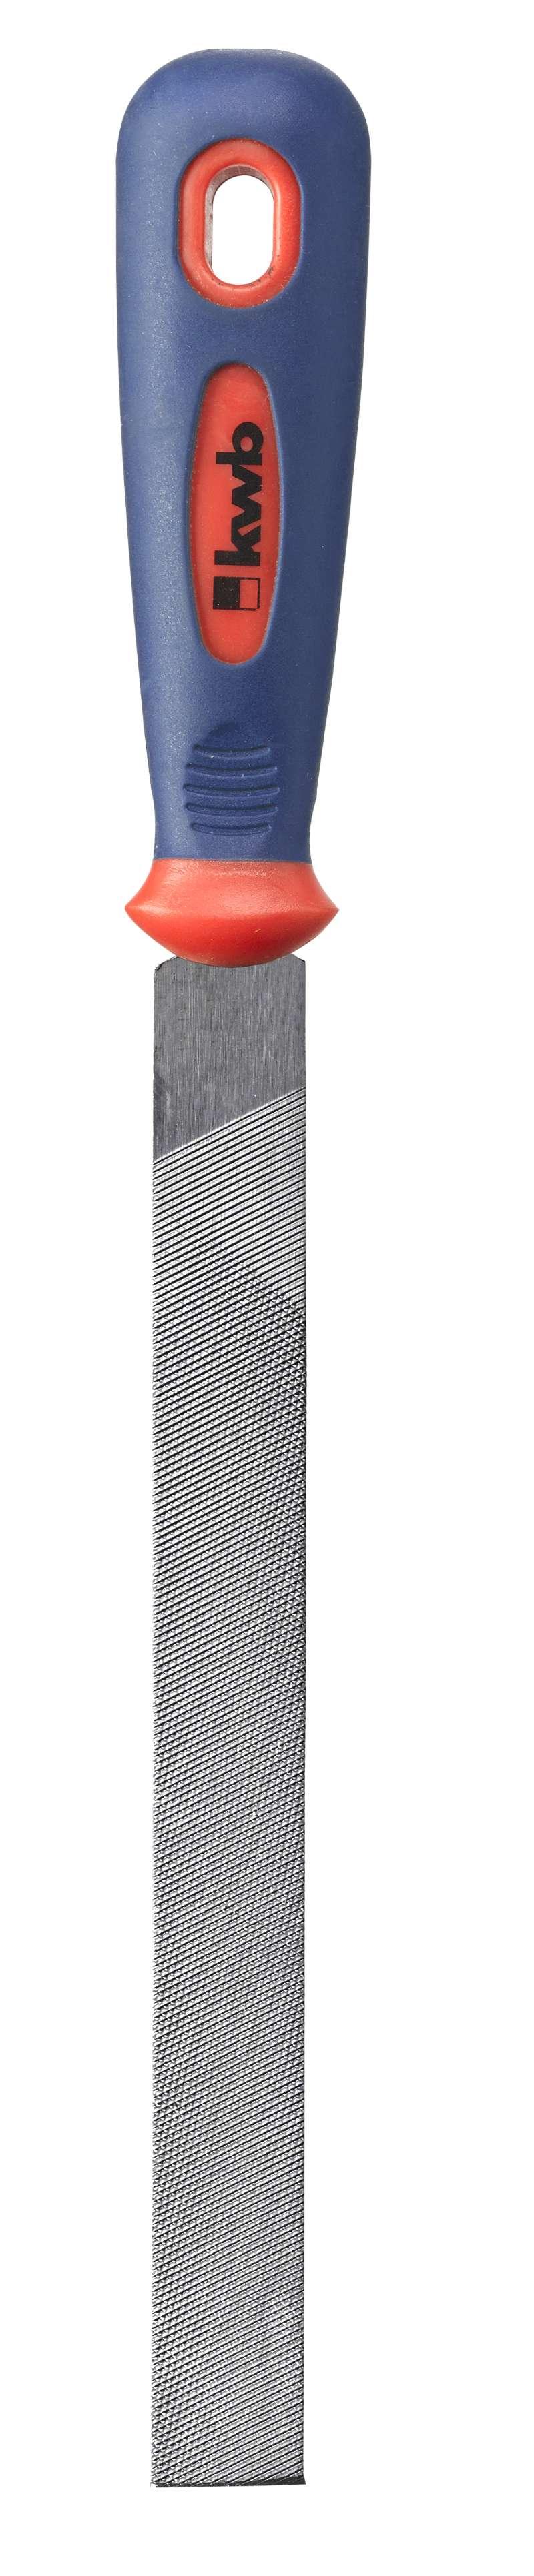 Напильник по металлу Kwb 4803-10